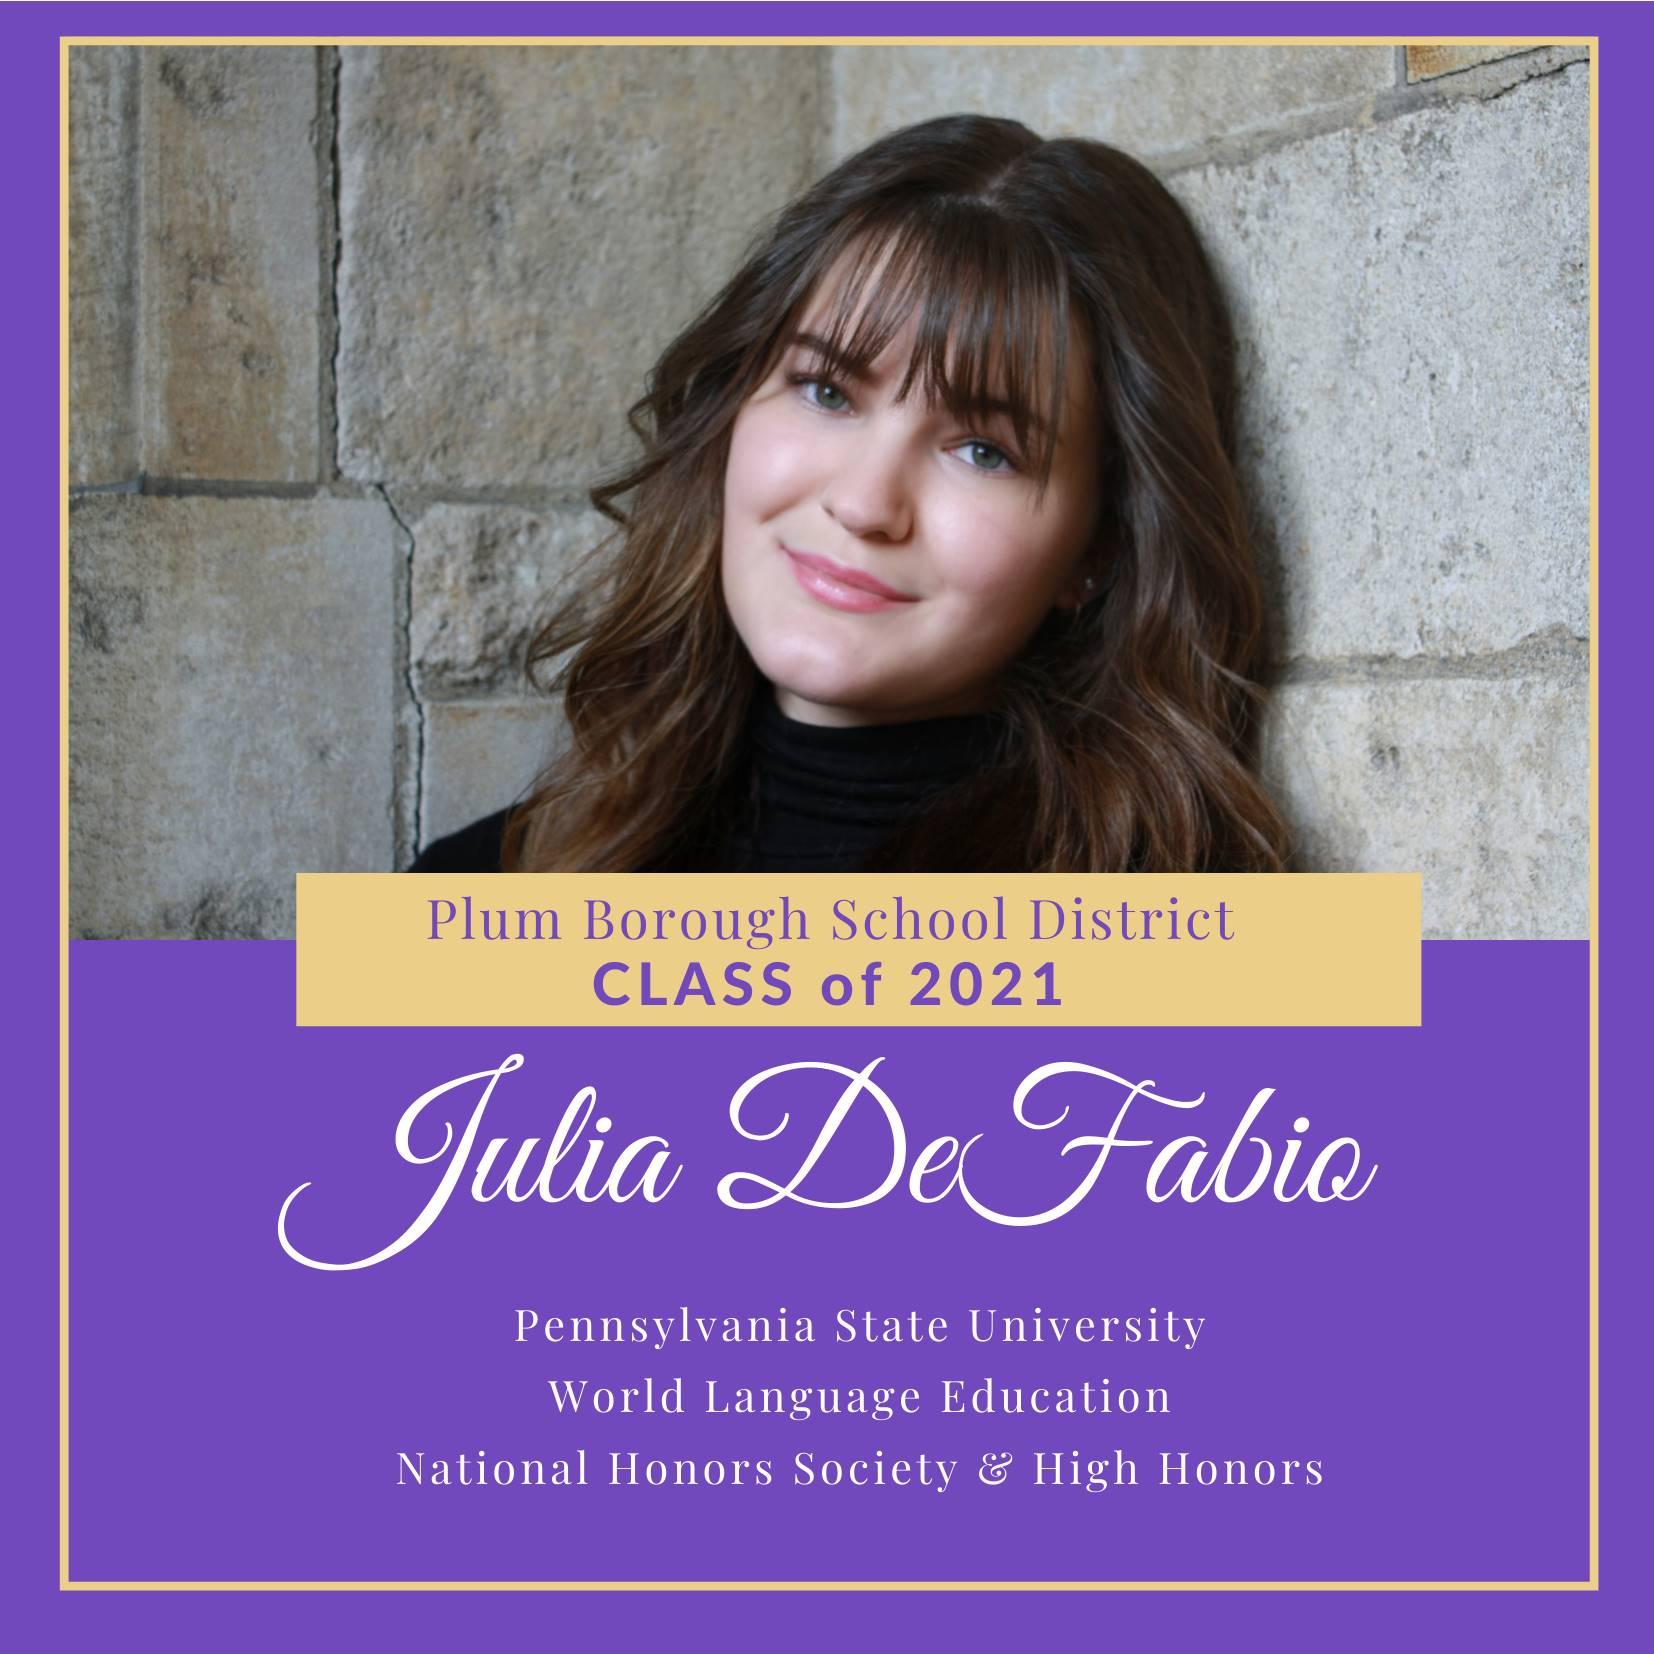 Congratulations to Julia DeFabio, Class of 2021!